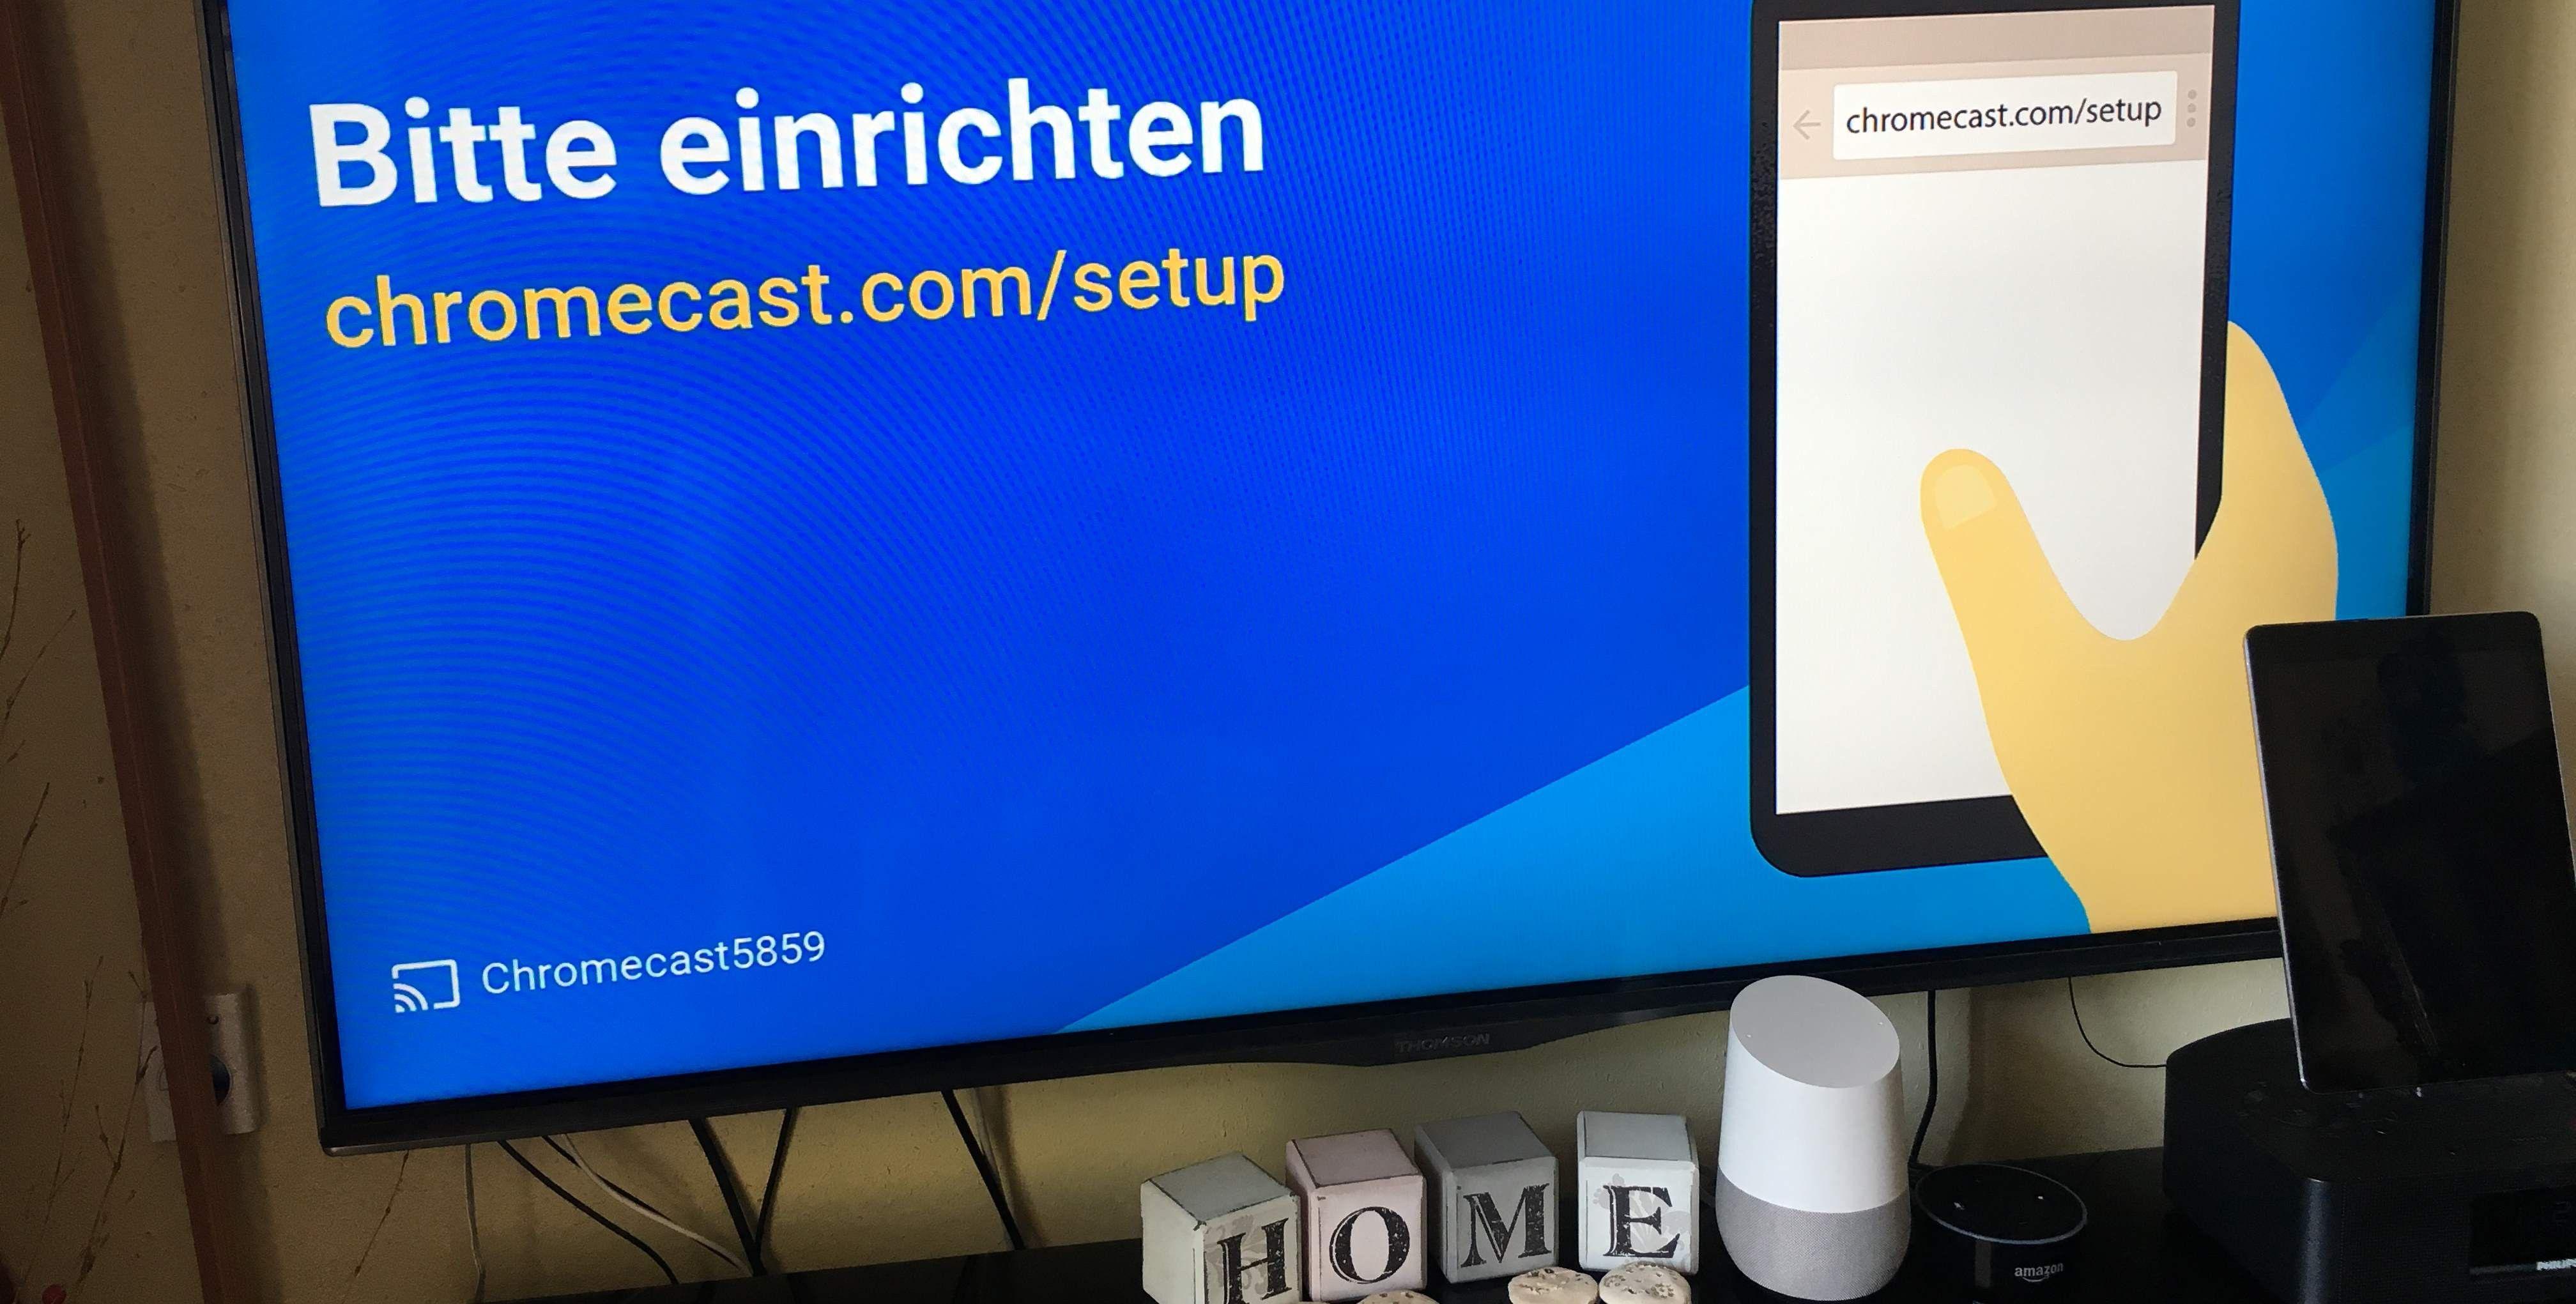 google home chromecast im test schlauer als alexa pc welt. Black Bedroom Furniture Sets. Home Design Ideas